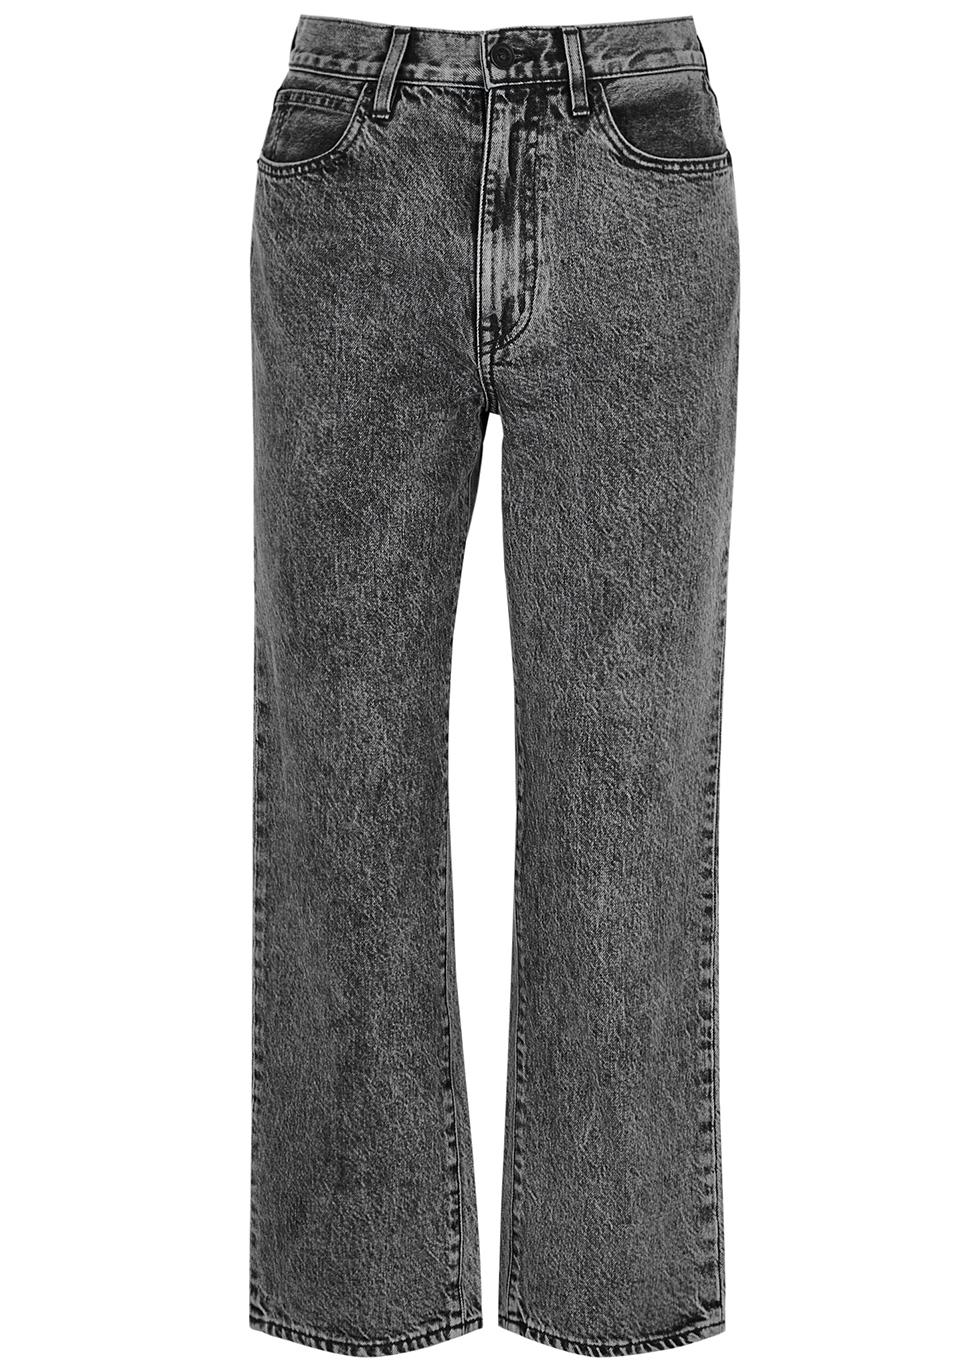 London grey straight-leg jeans